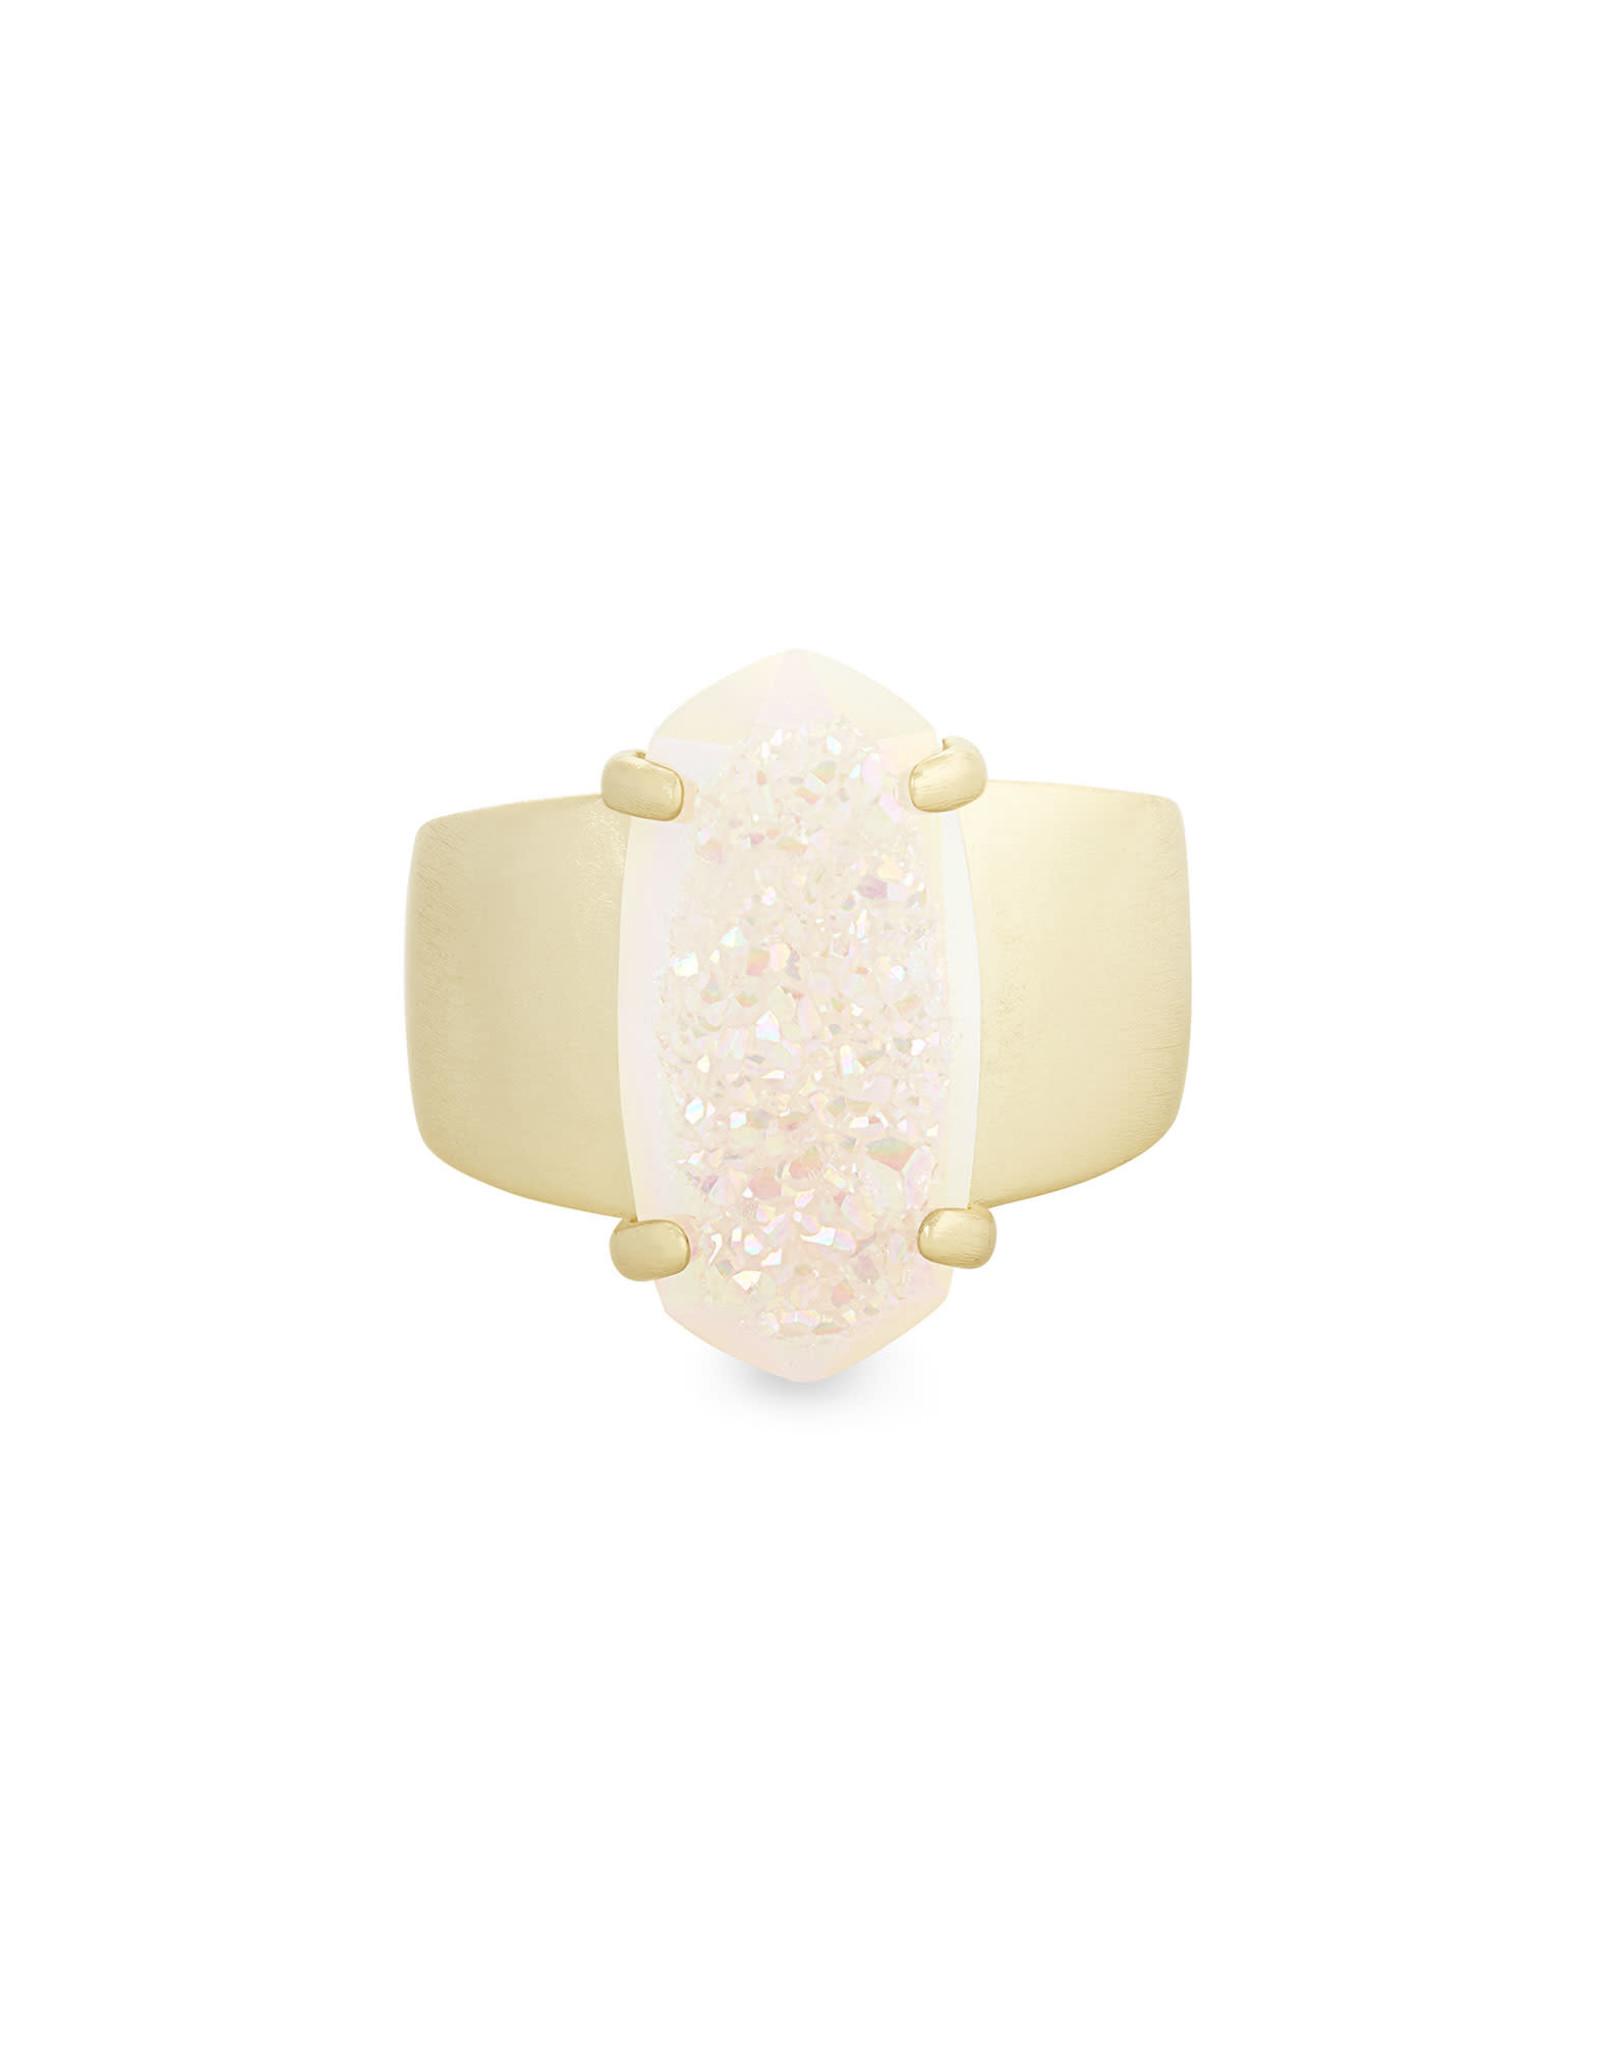 Kendra Scott Harrison Cocktail Ring - Iridescent Drusy/Gold Size 7